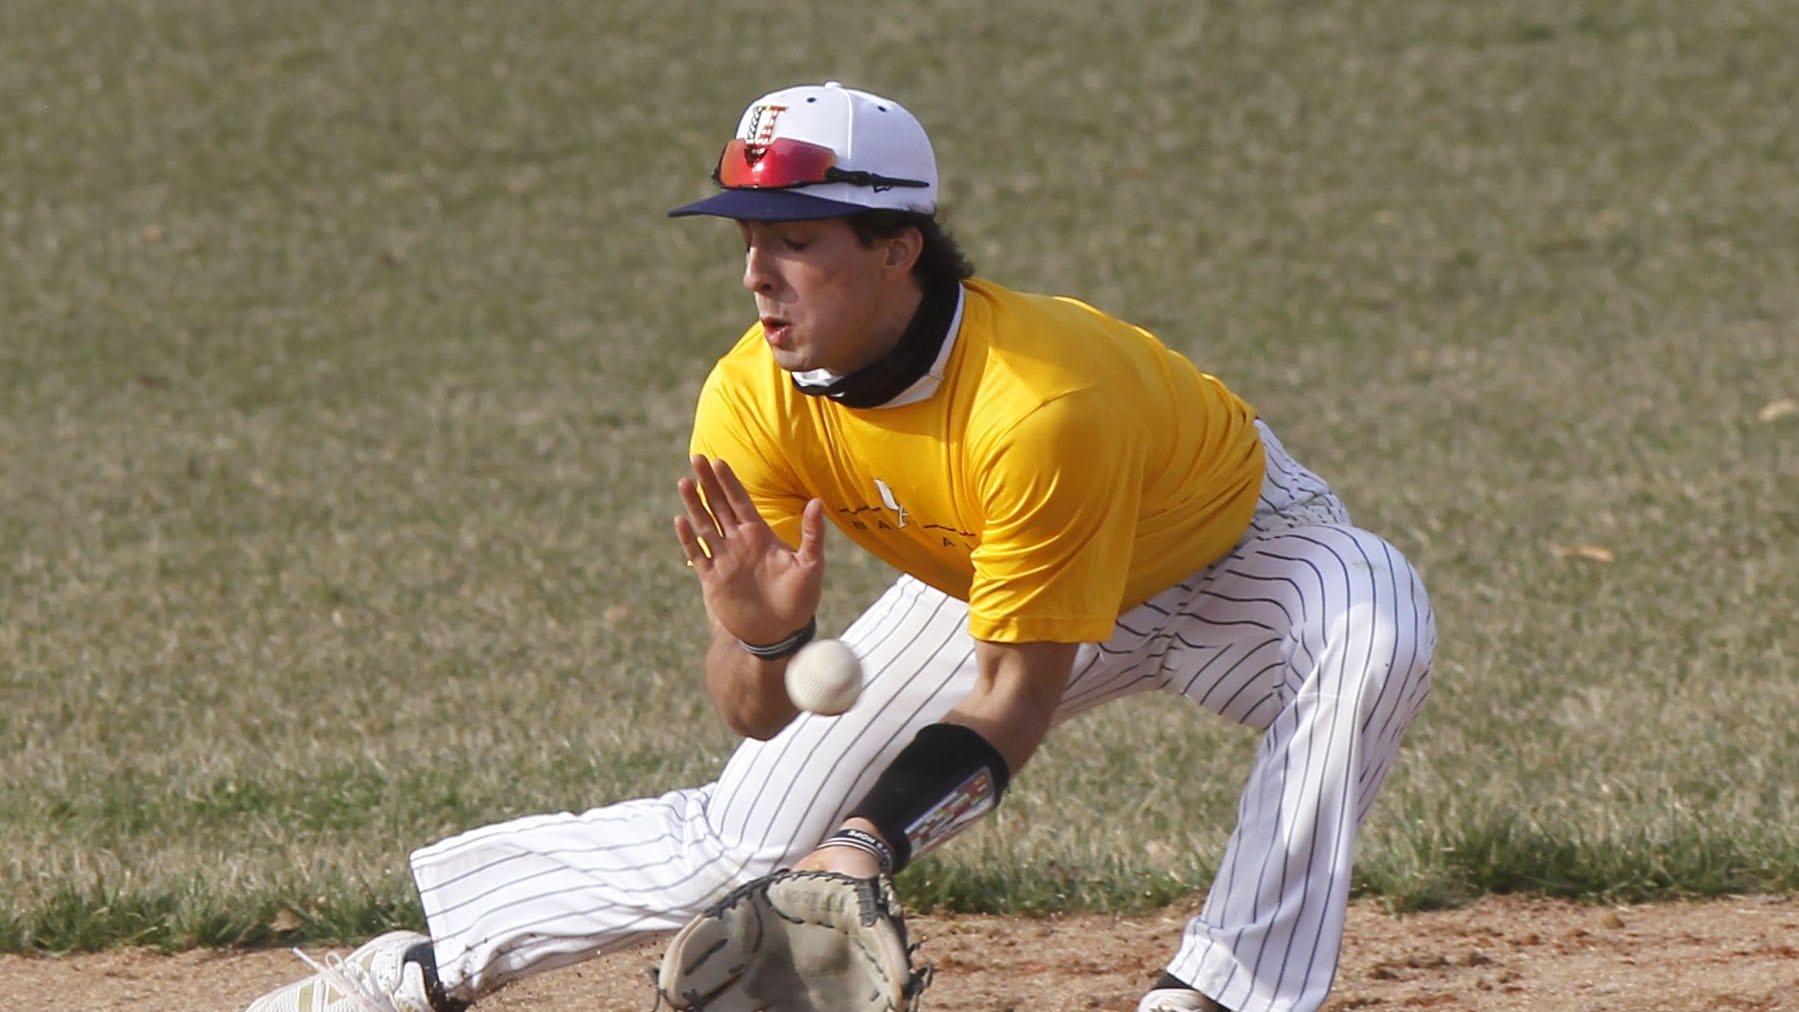 Upper Arlington Roundup: Pitching depth to benefit Golden Bears baseball team